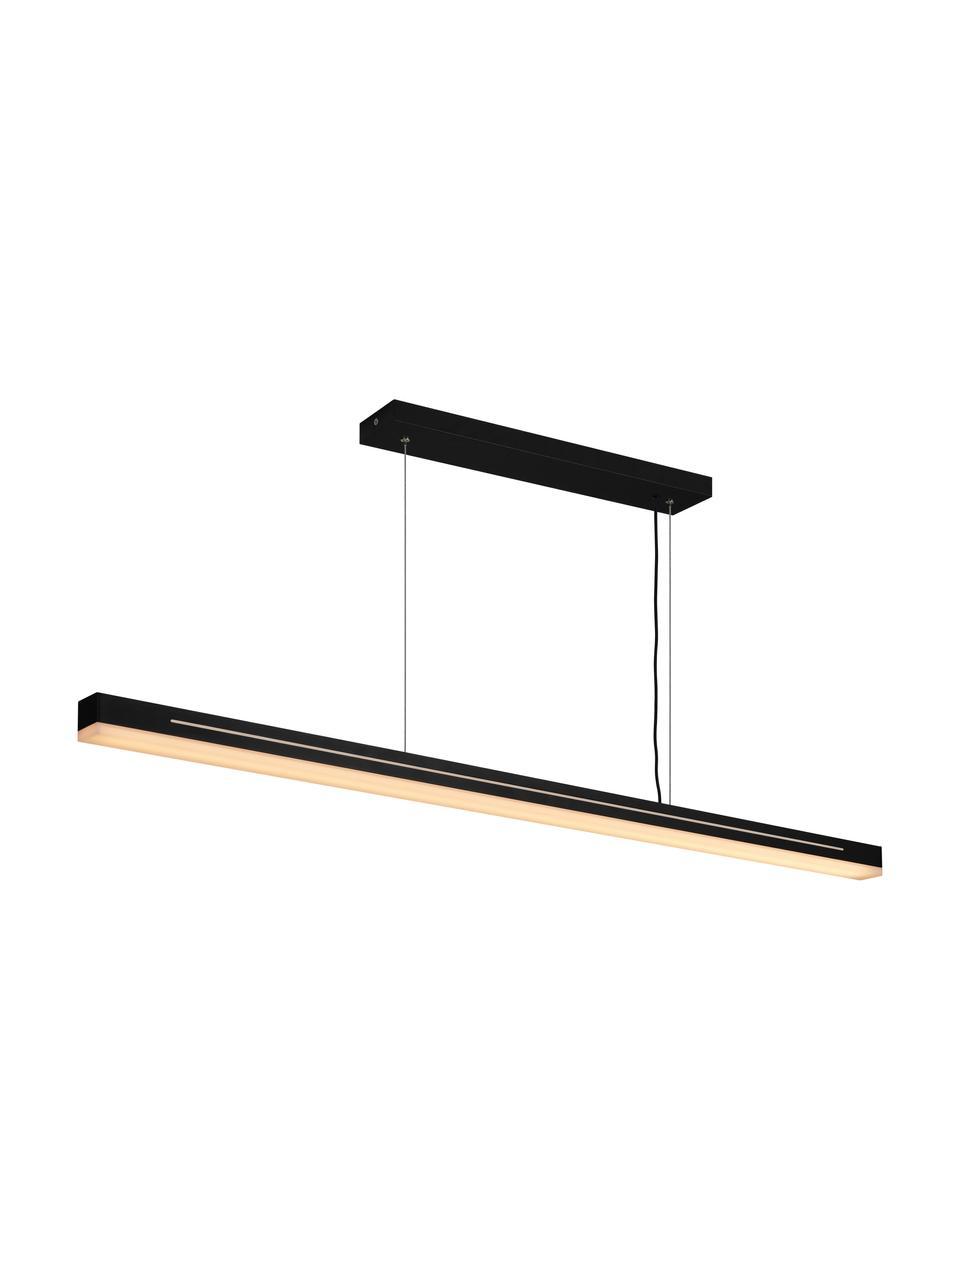 Große LED-Pendelleuchte Skylar in Schwarz, Lampenschirm: Aluminium, beschichtet, Baldachin: Aluminium, beschichtet, Schwarz, 115 x 4 cm